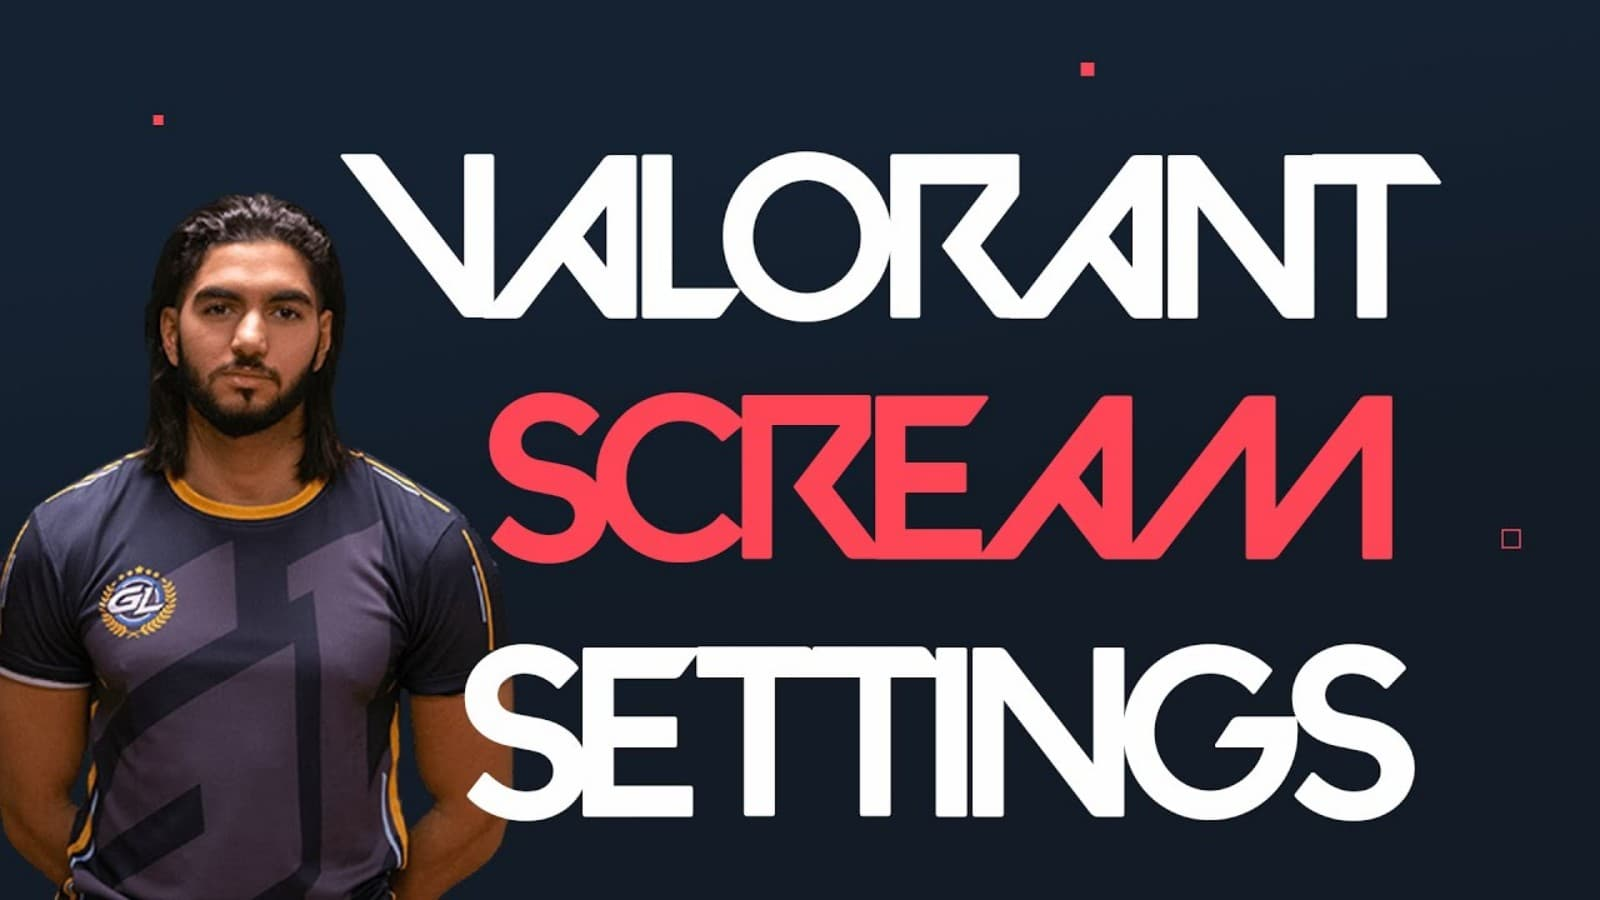 ScreaM Valorant Settings, Crosshair, Key bindings, and PC Specs